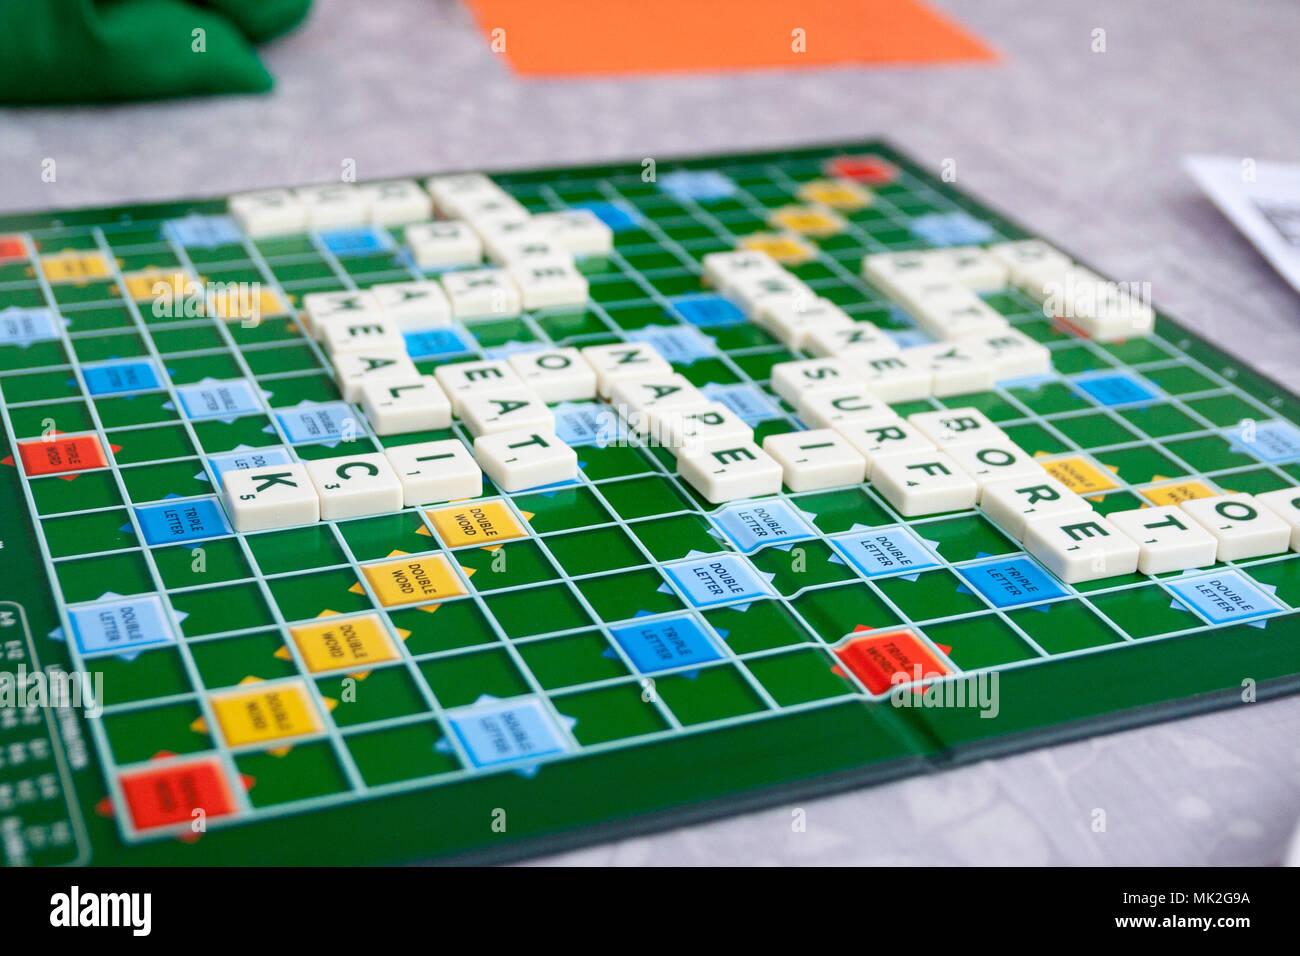 Kinder Kinder Familie Brettspiel Scrabble Brettspiel Pädagogische